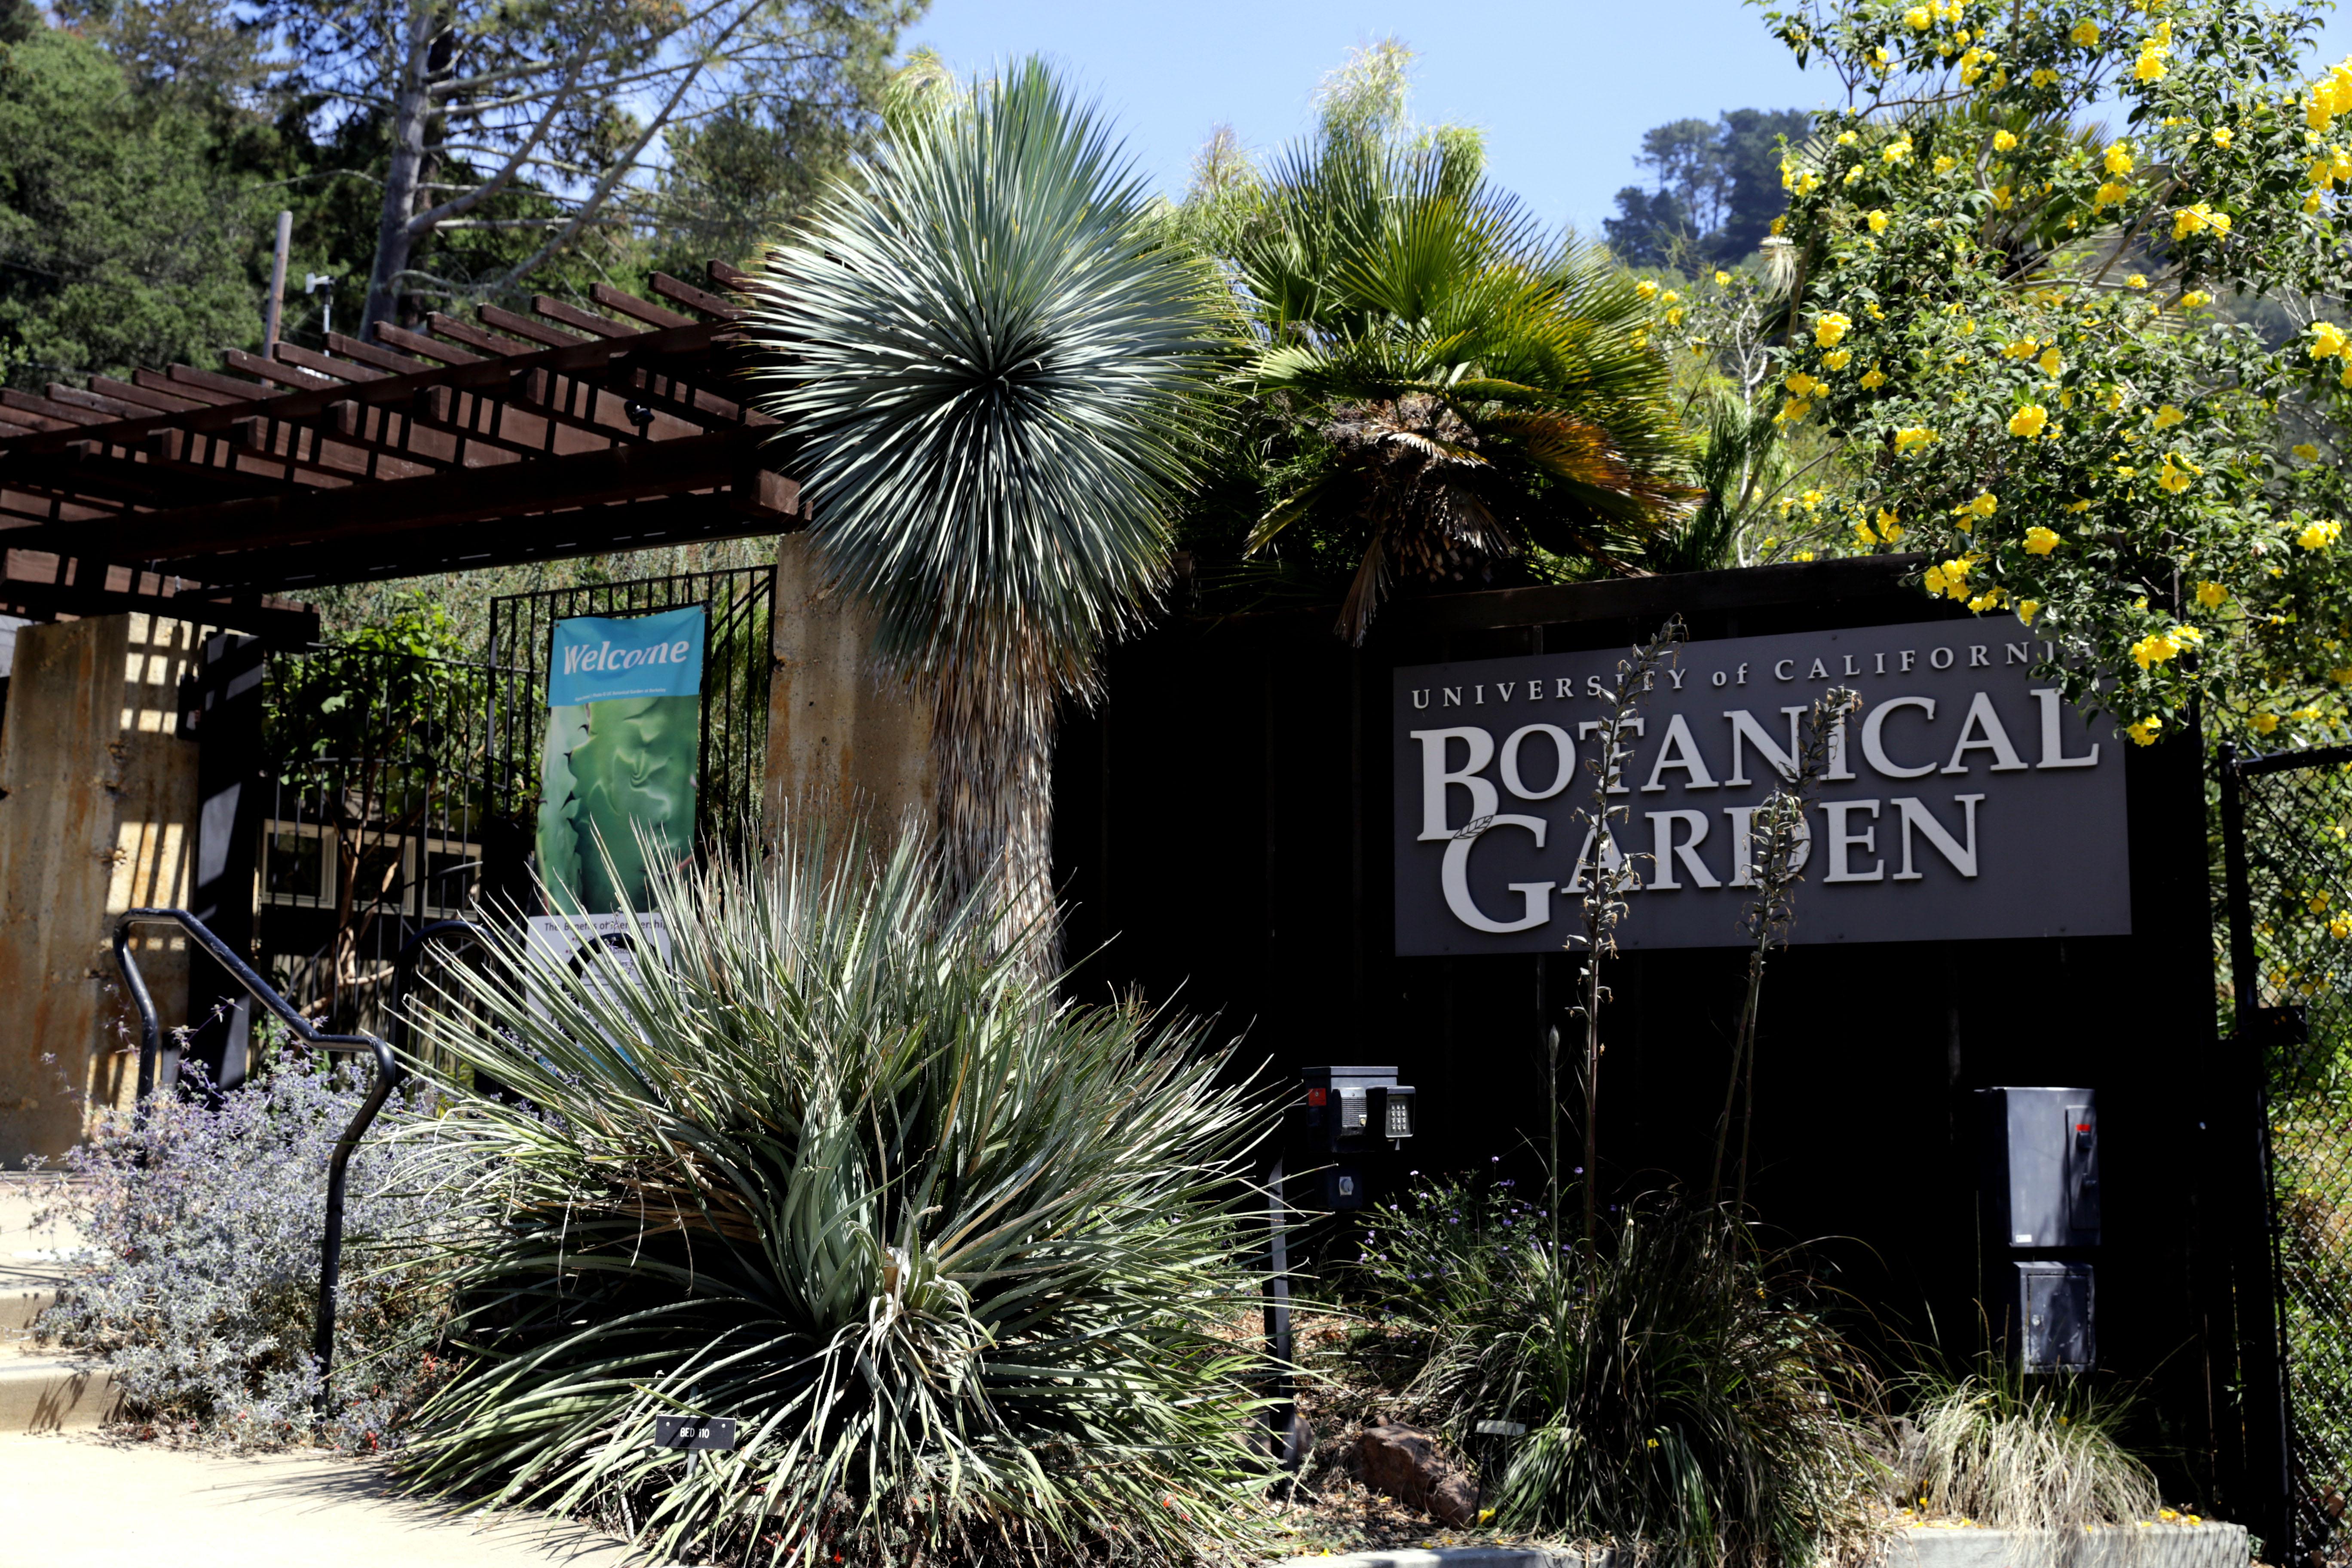 University of California Botanical Garden Wikiwand